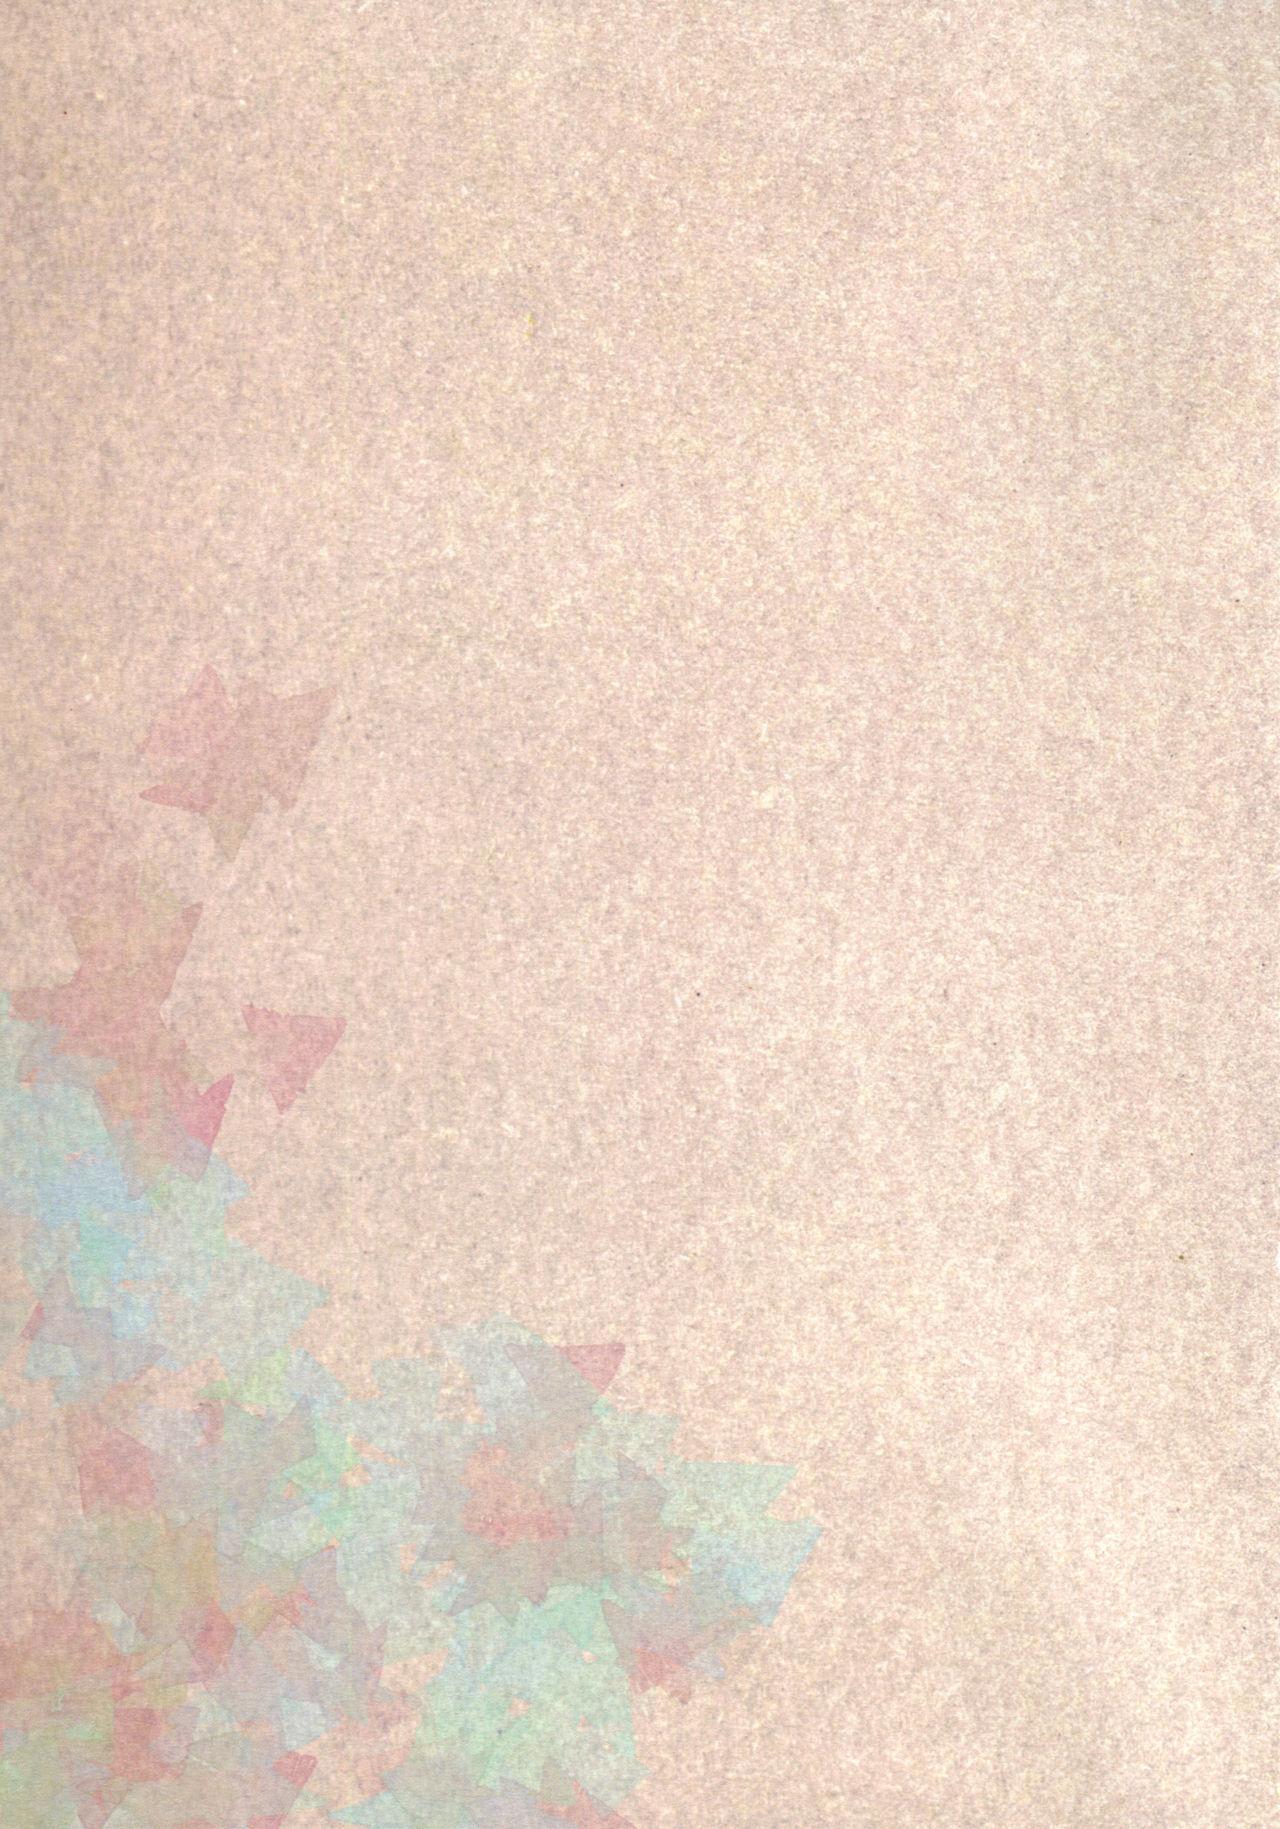 Hajimete no xxx | The first thing 22